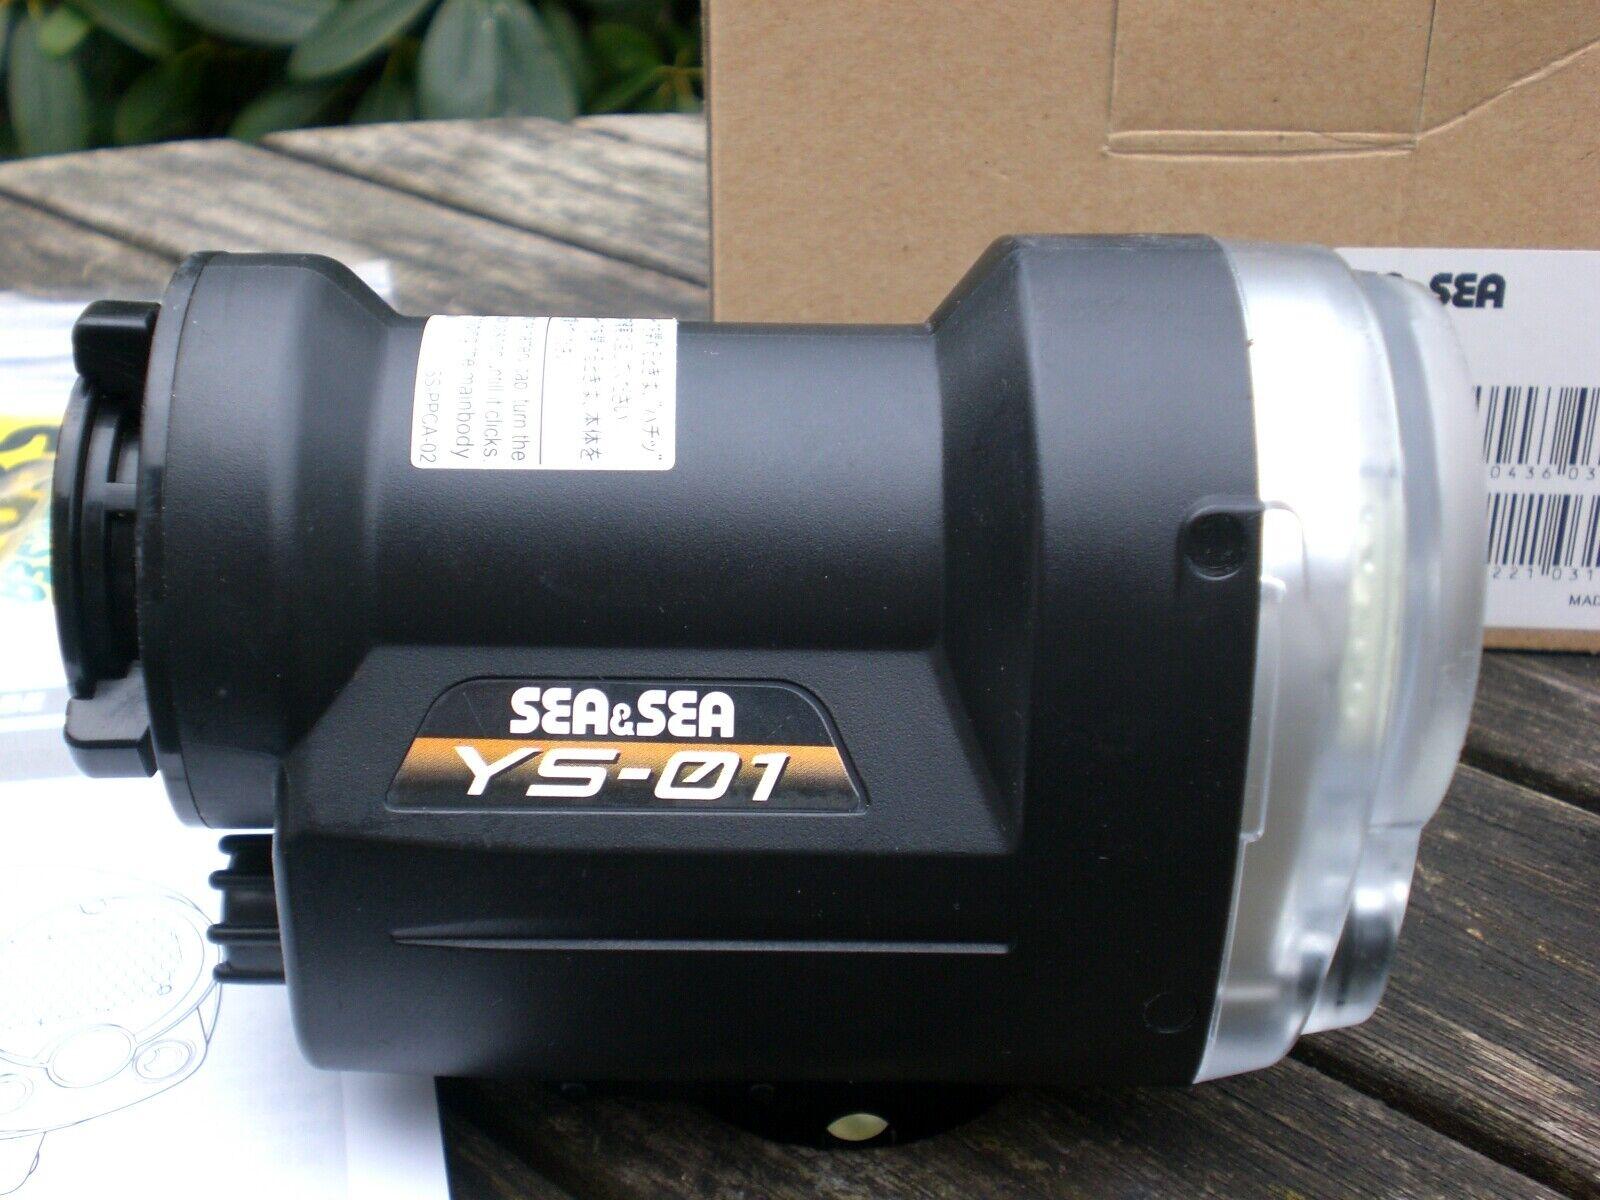 Sea&Sea Blitz YS 01 für Digitalkameras--Strobe